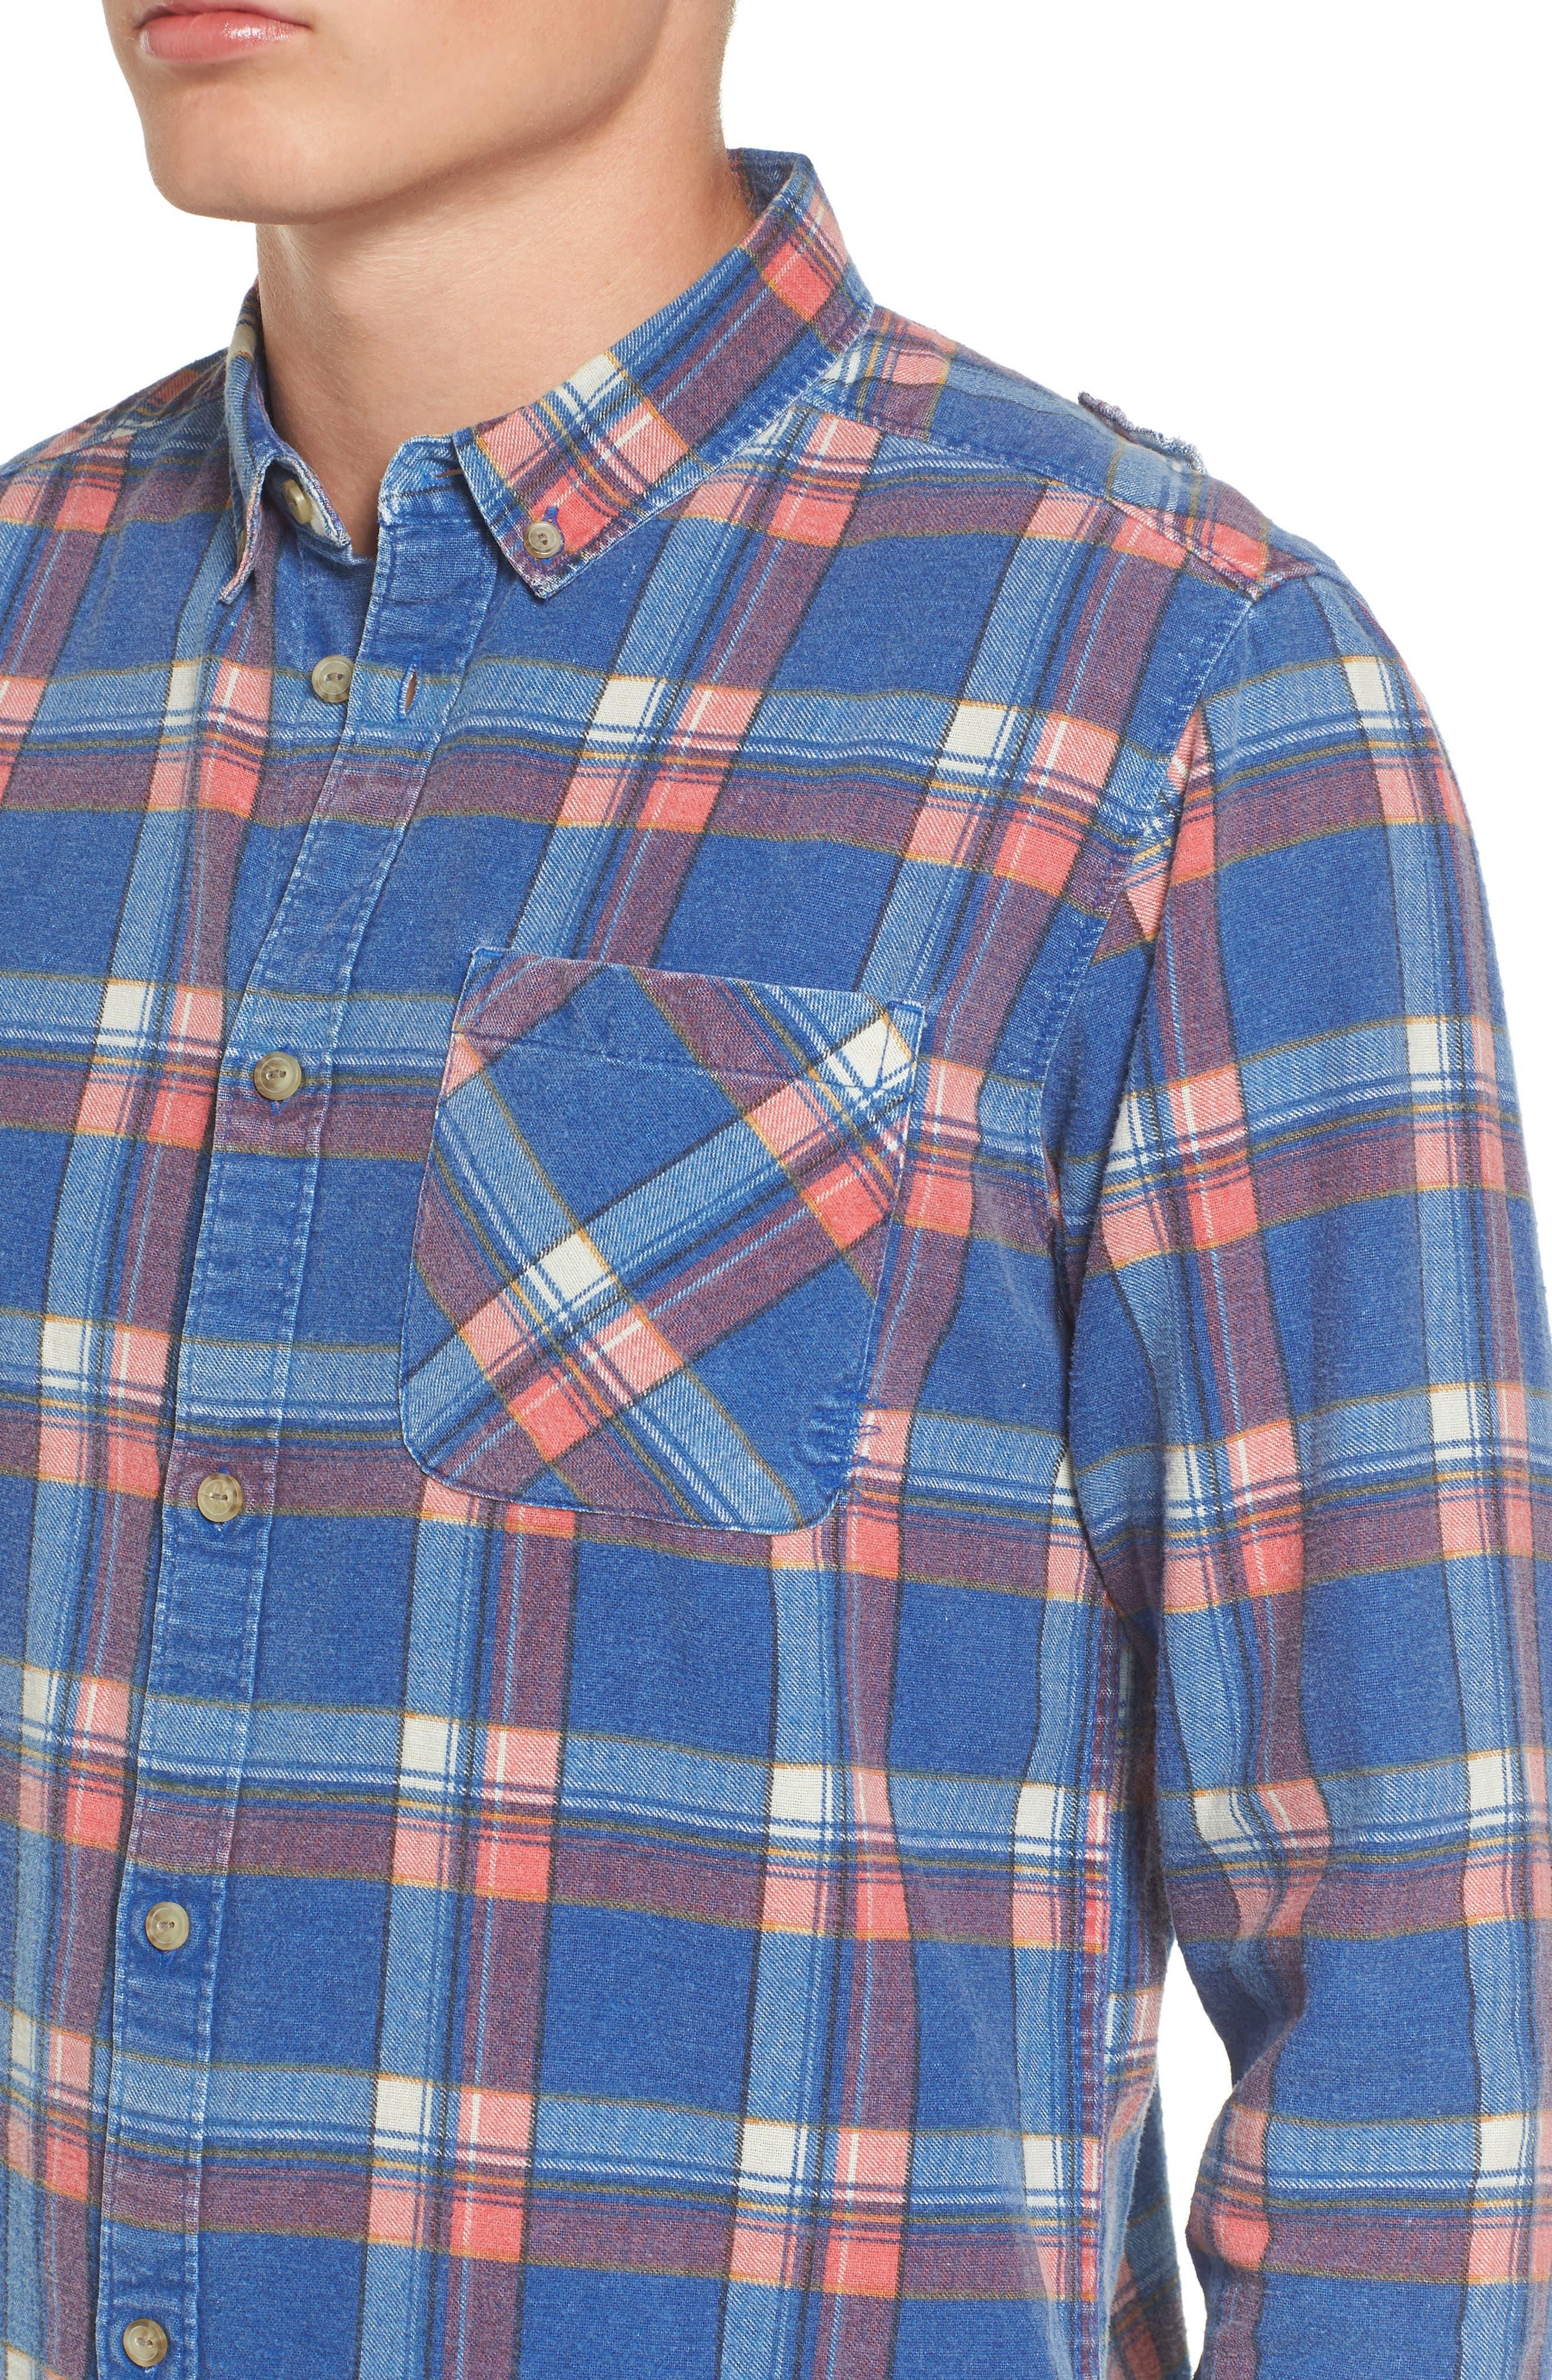 Alternate Image 4  - RVCA x Kevin Long Plaid Shirt